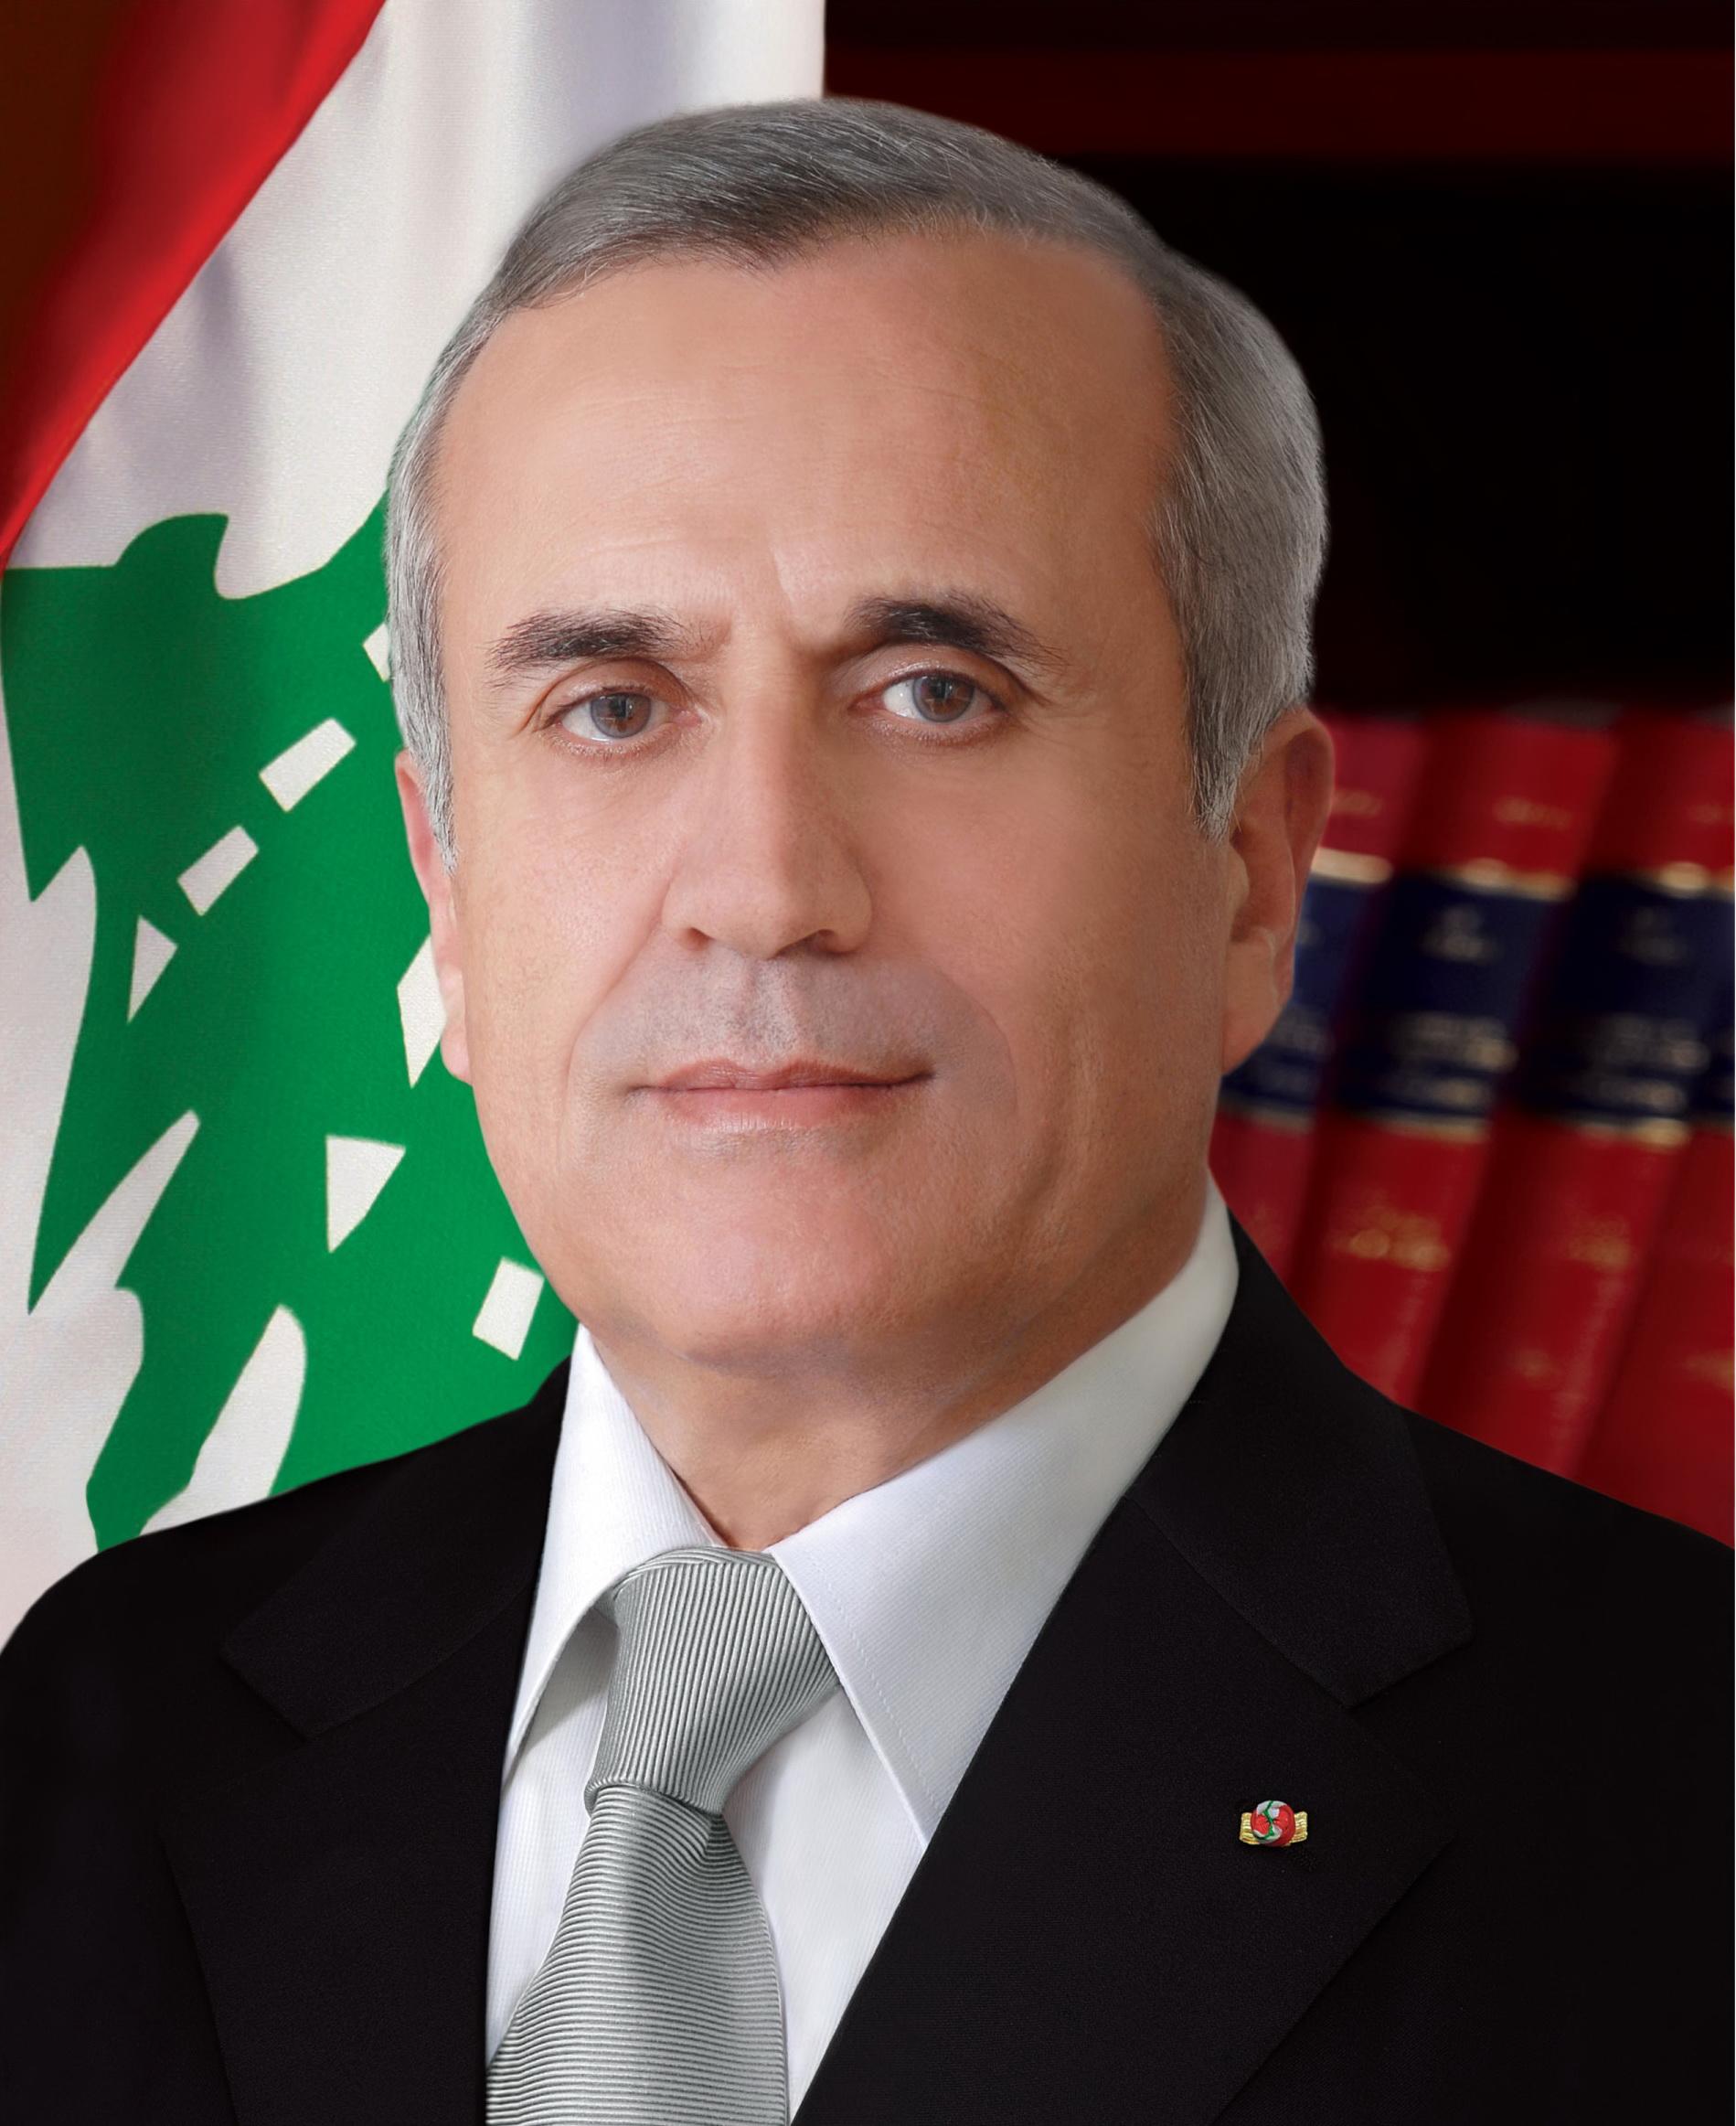 President Michel Soliman